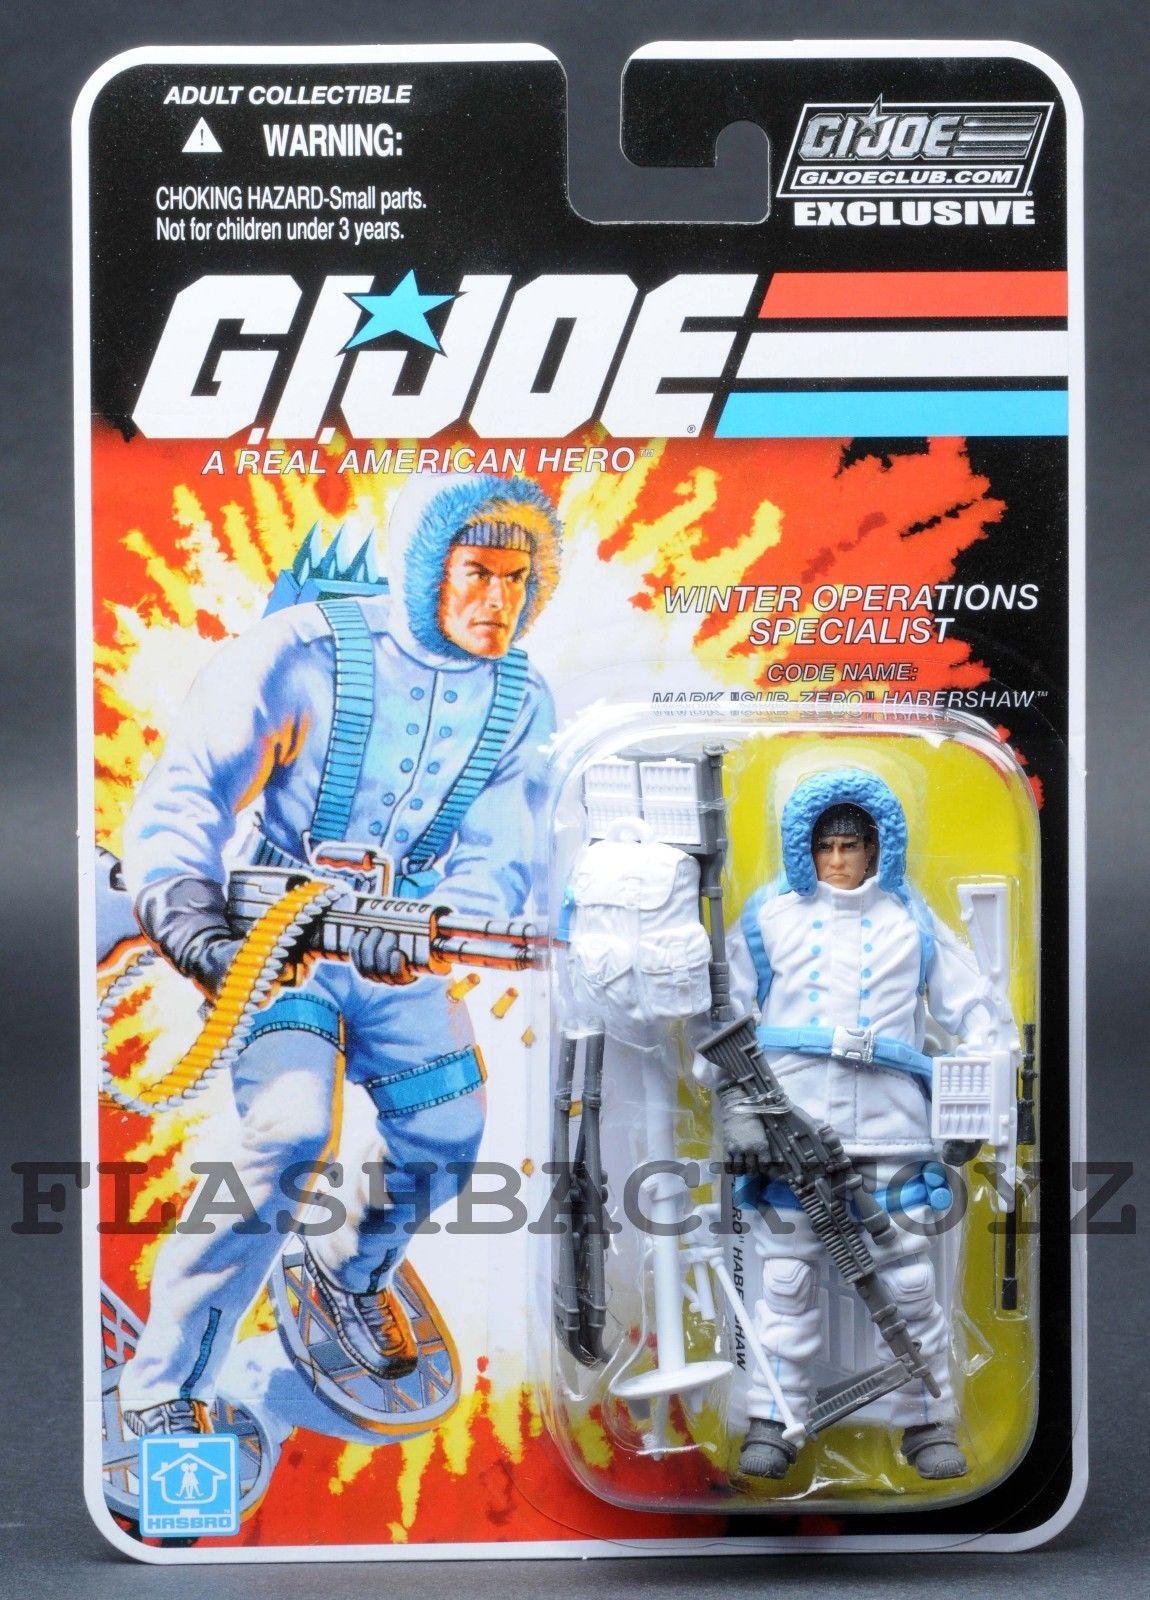 2017 GI Joe Dojo Ninja Commando Club Exclusive Subscription FSS 6.0 MOC